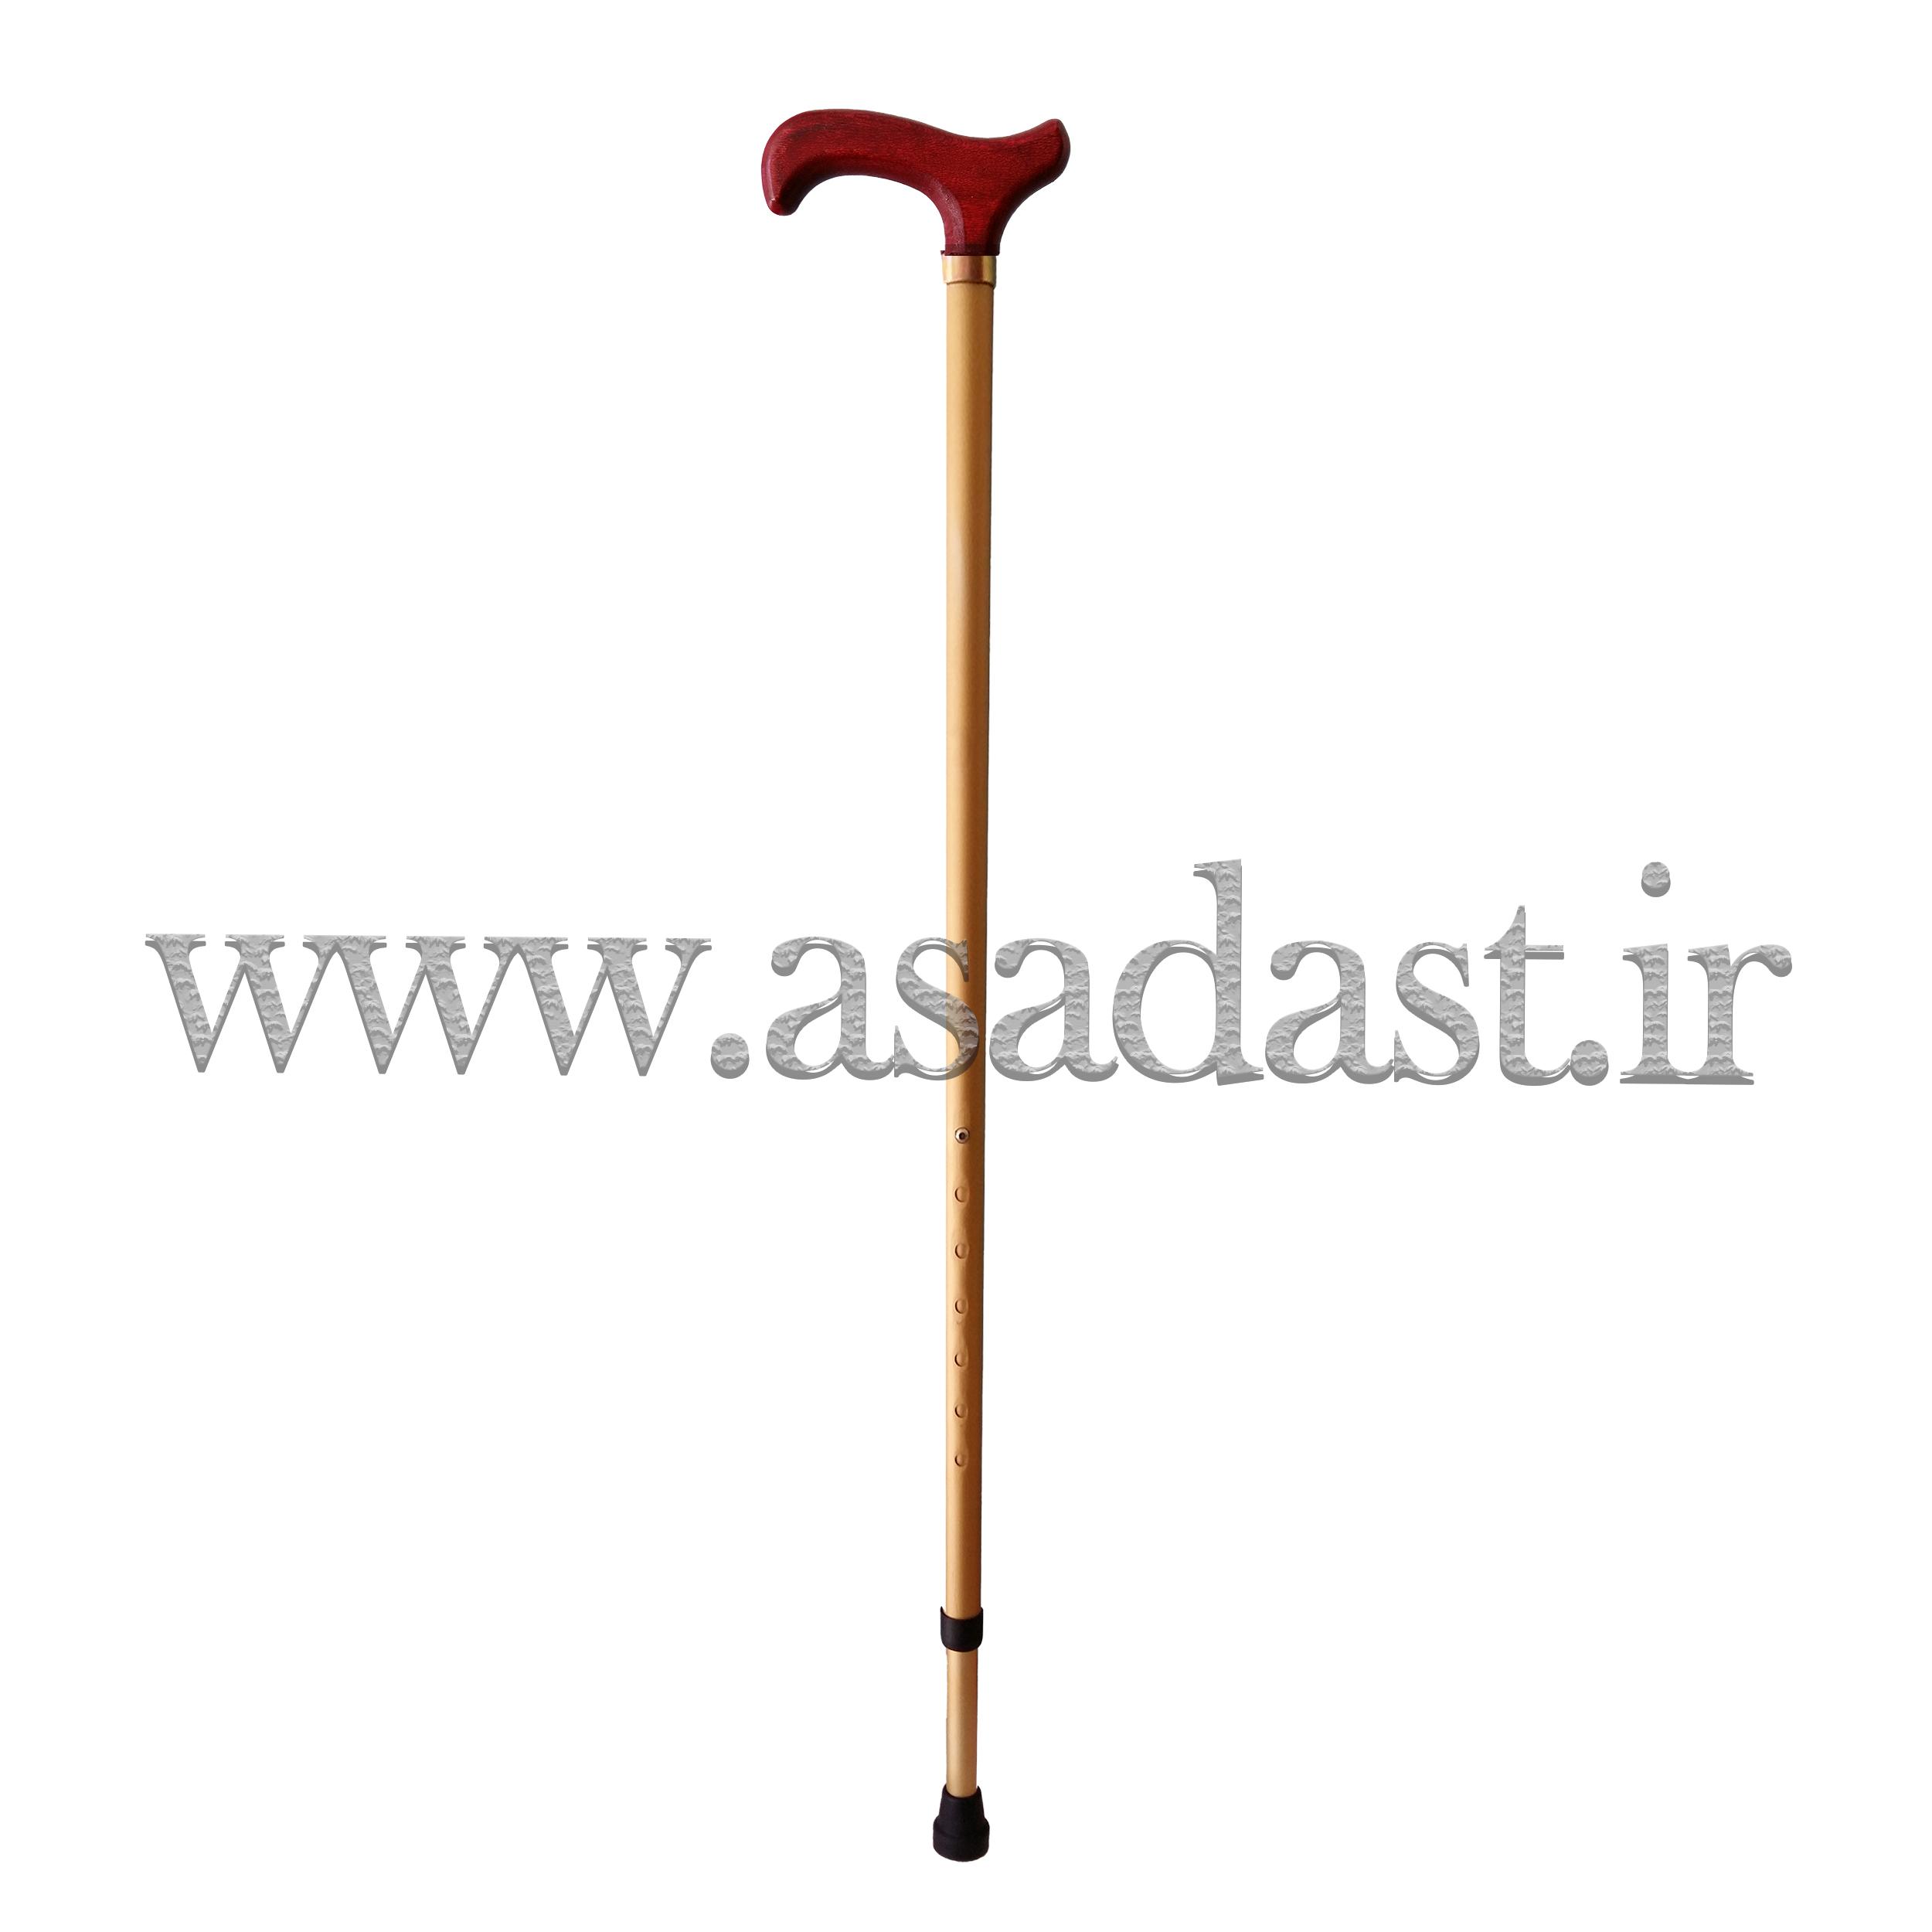 عصای دسته چوبی قابل تنظیم مدل 2-1021